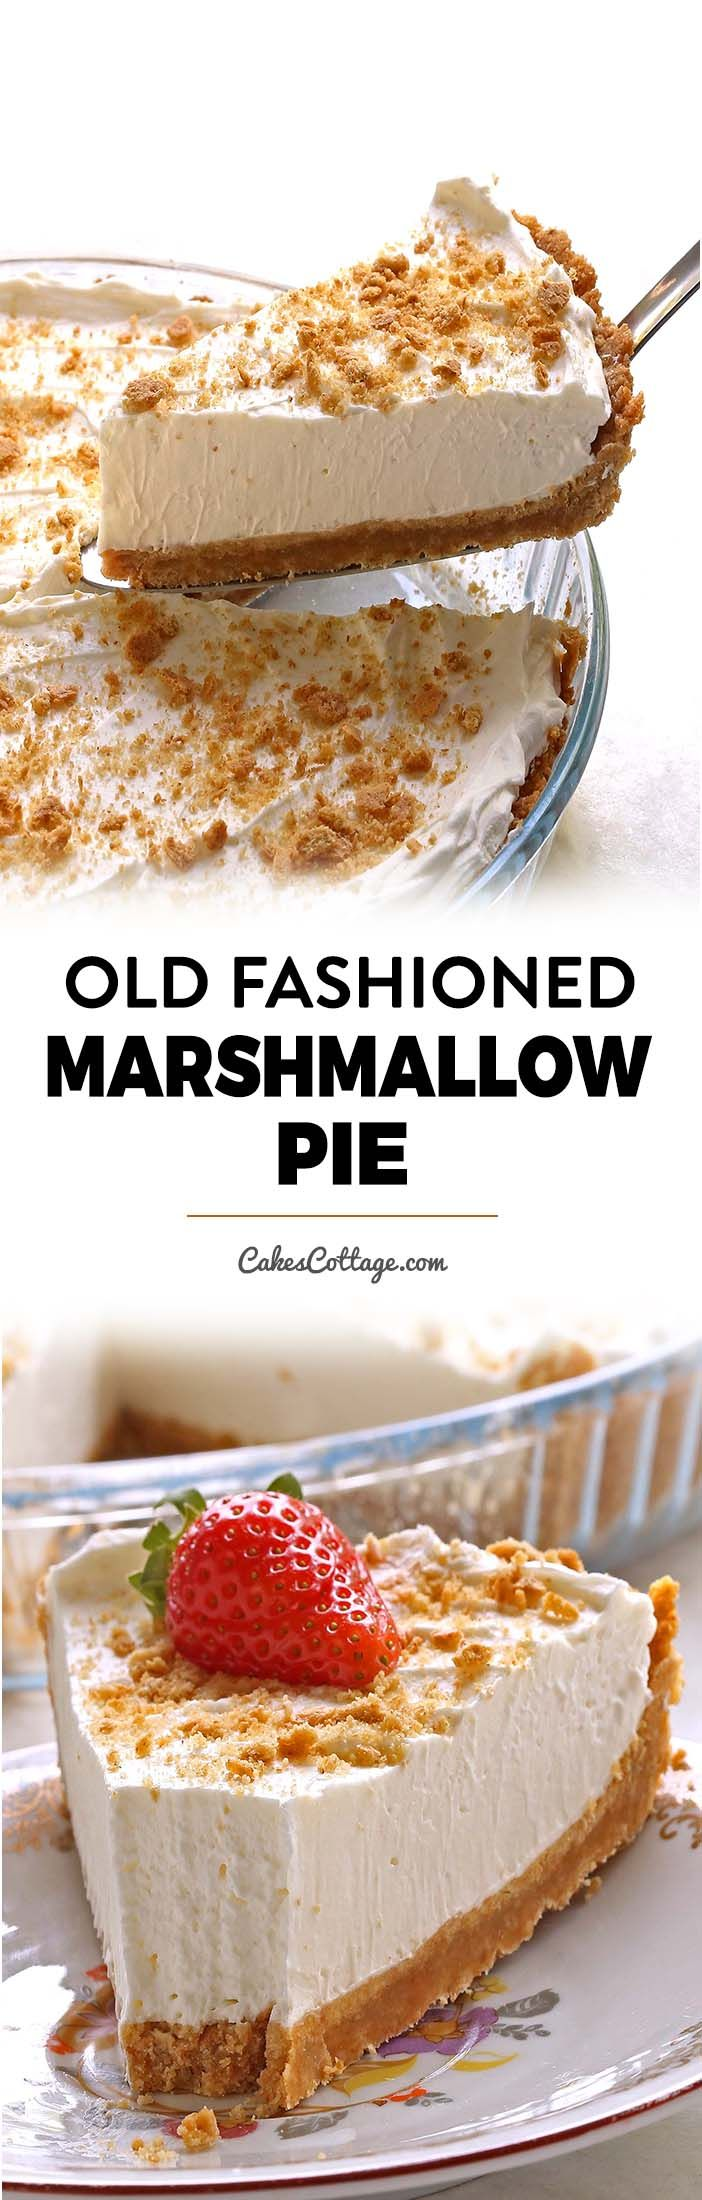 Easy Marshmallow Pie #marshmallow